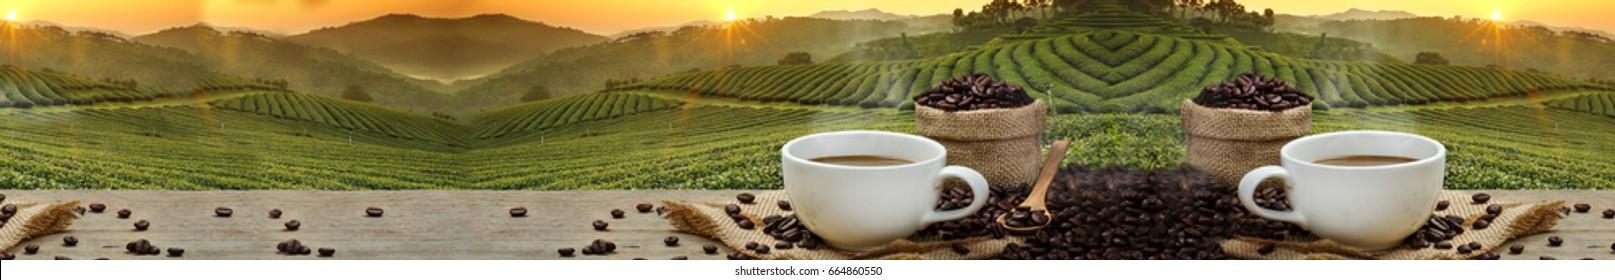 Coffee theme, coffee plantation